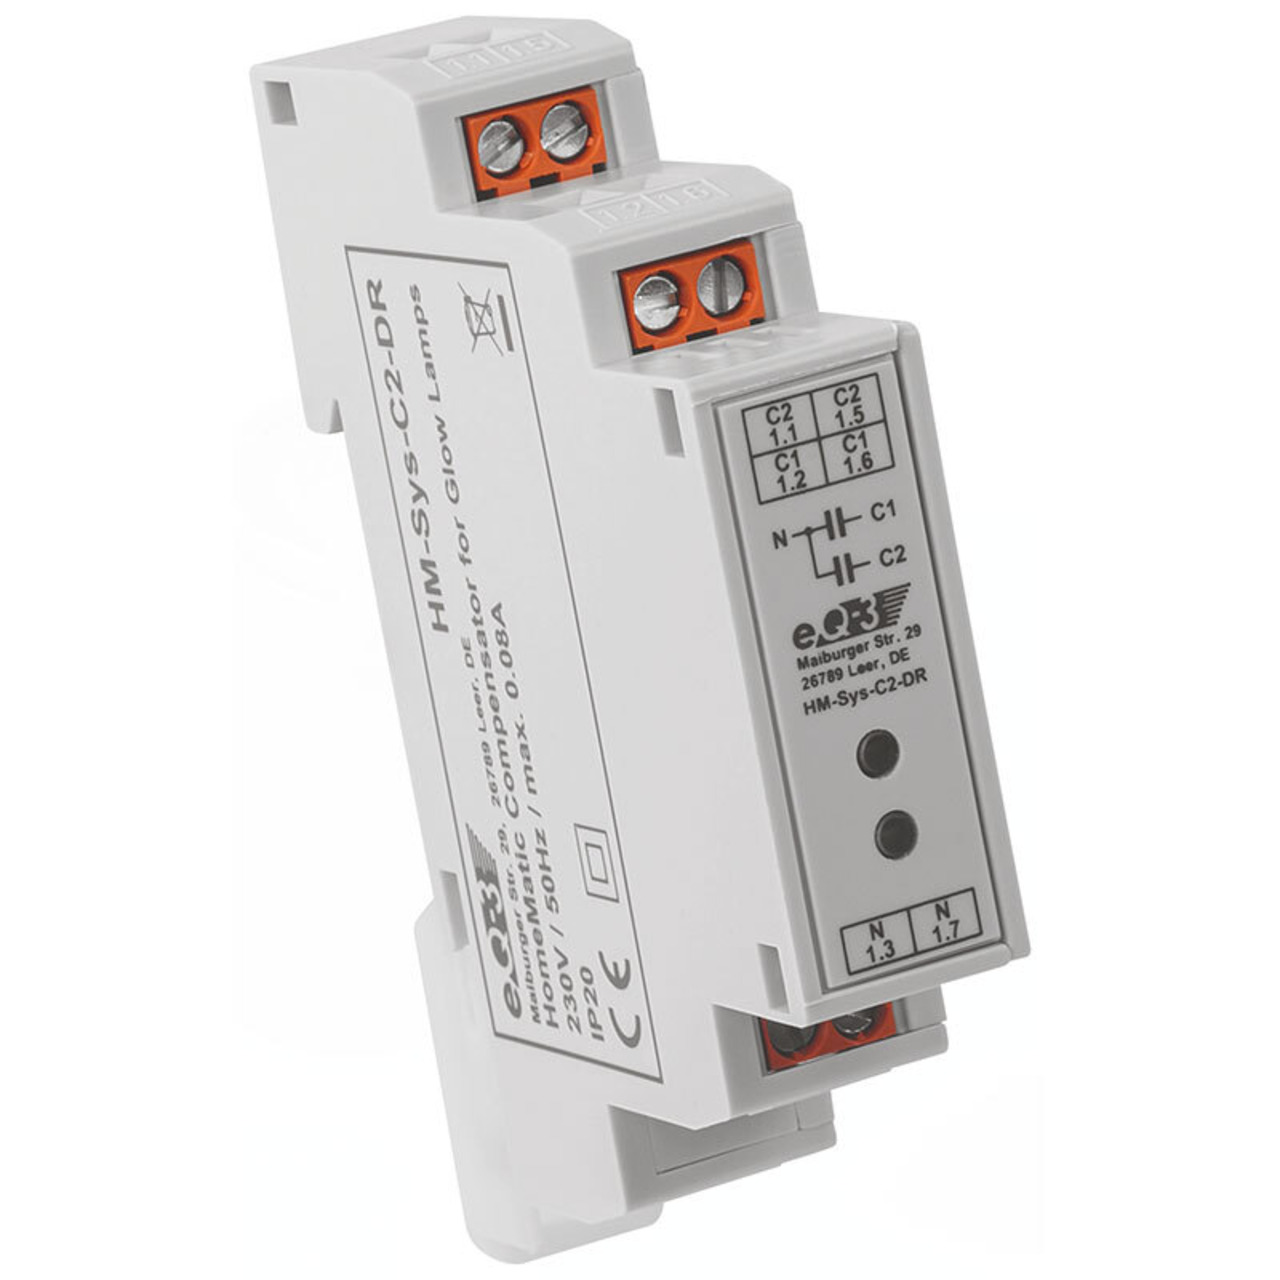 ELV Homematic Komplettbausatz Kompensator fund-252 r Glimmlampen HM-Sys-C2-DR